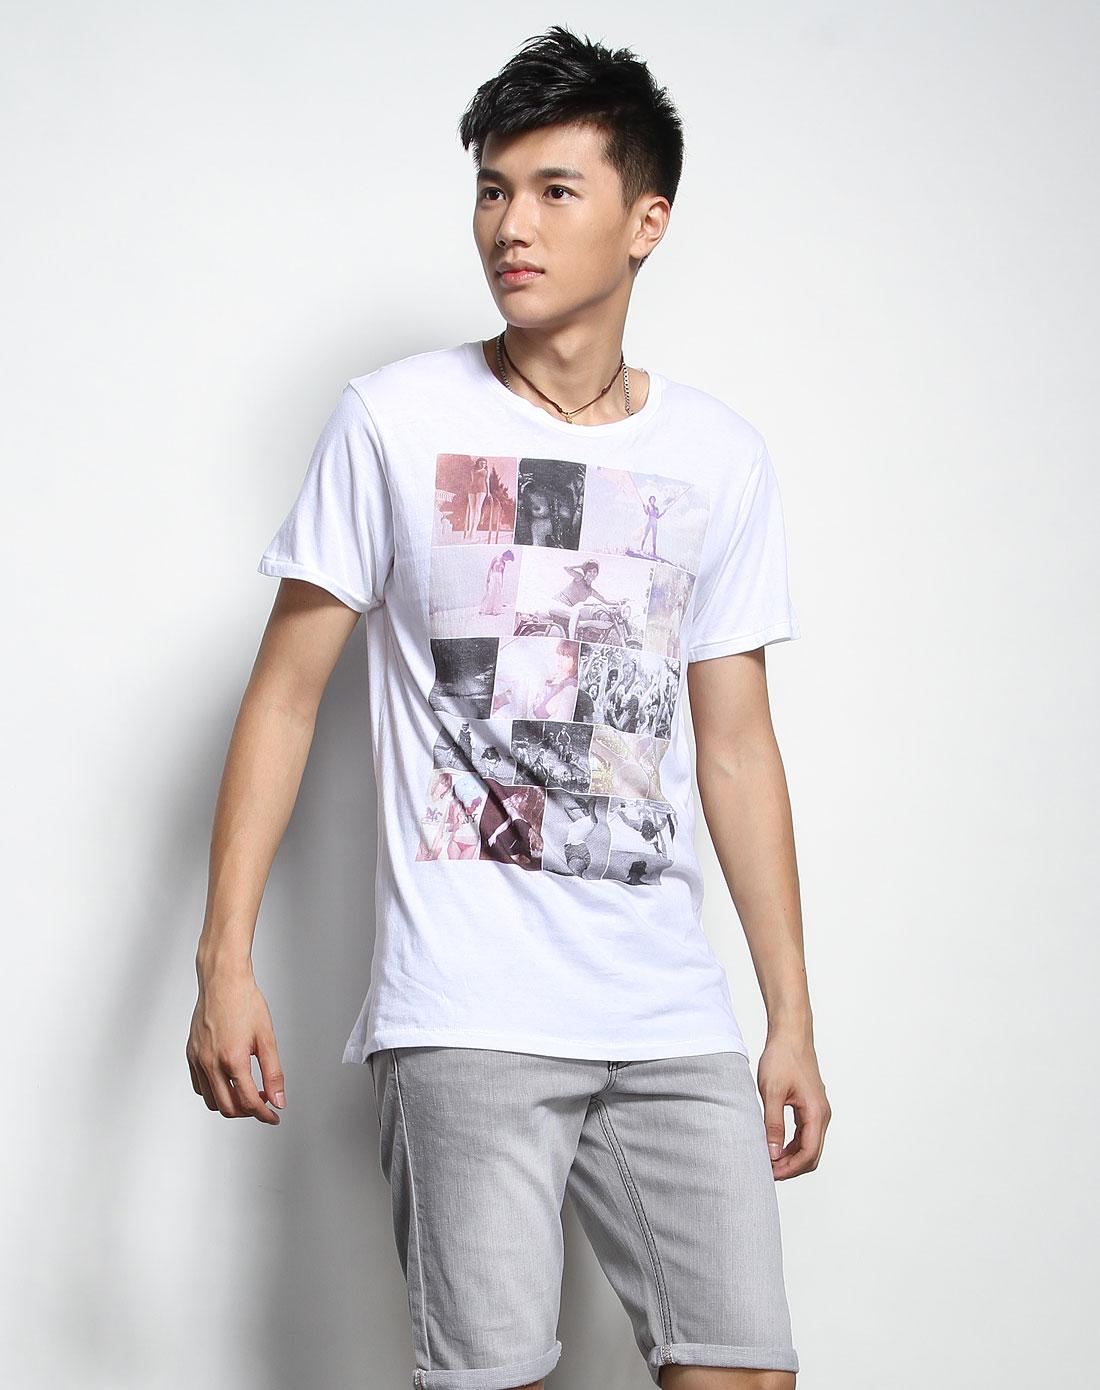 潮牌supreme being 男款白色个性印图短袖t恤衫sbstl